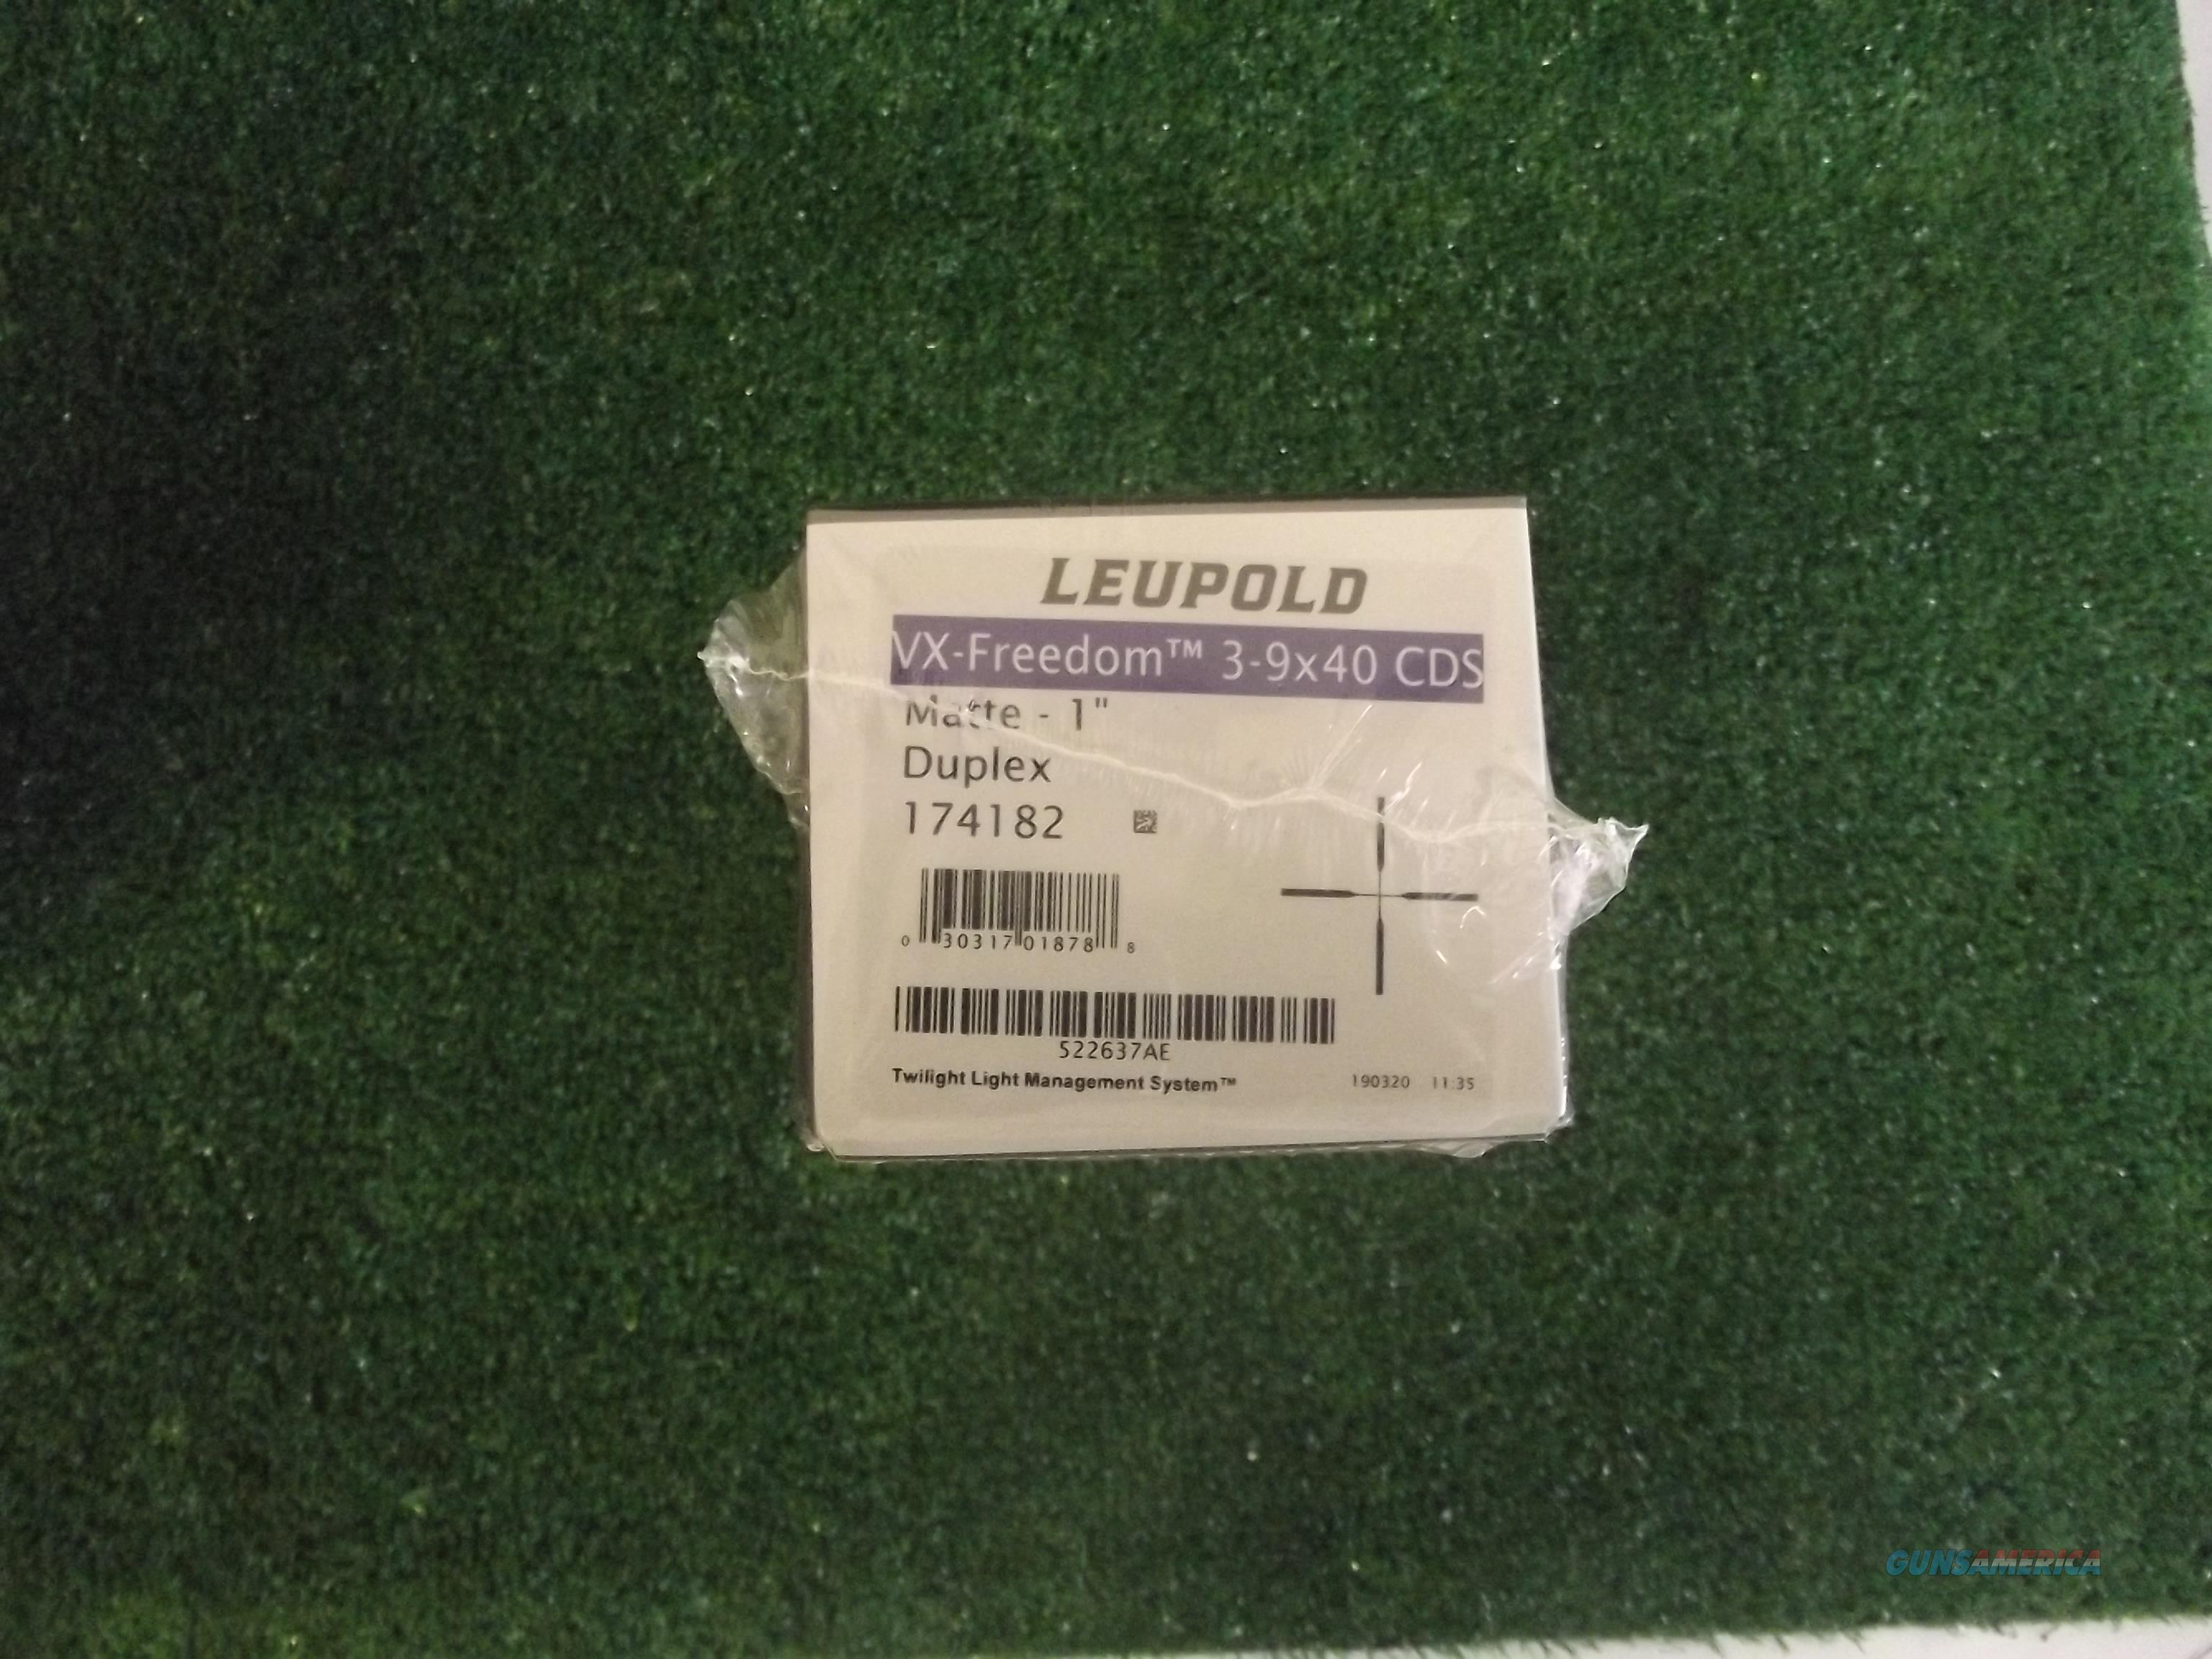 Leupold VX-Freedom 3-9x40 CDS Duplex  Non-Guns > Scopes/Mounts/Rings & Optics > Rifle Scopes > Variable Focal Length